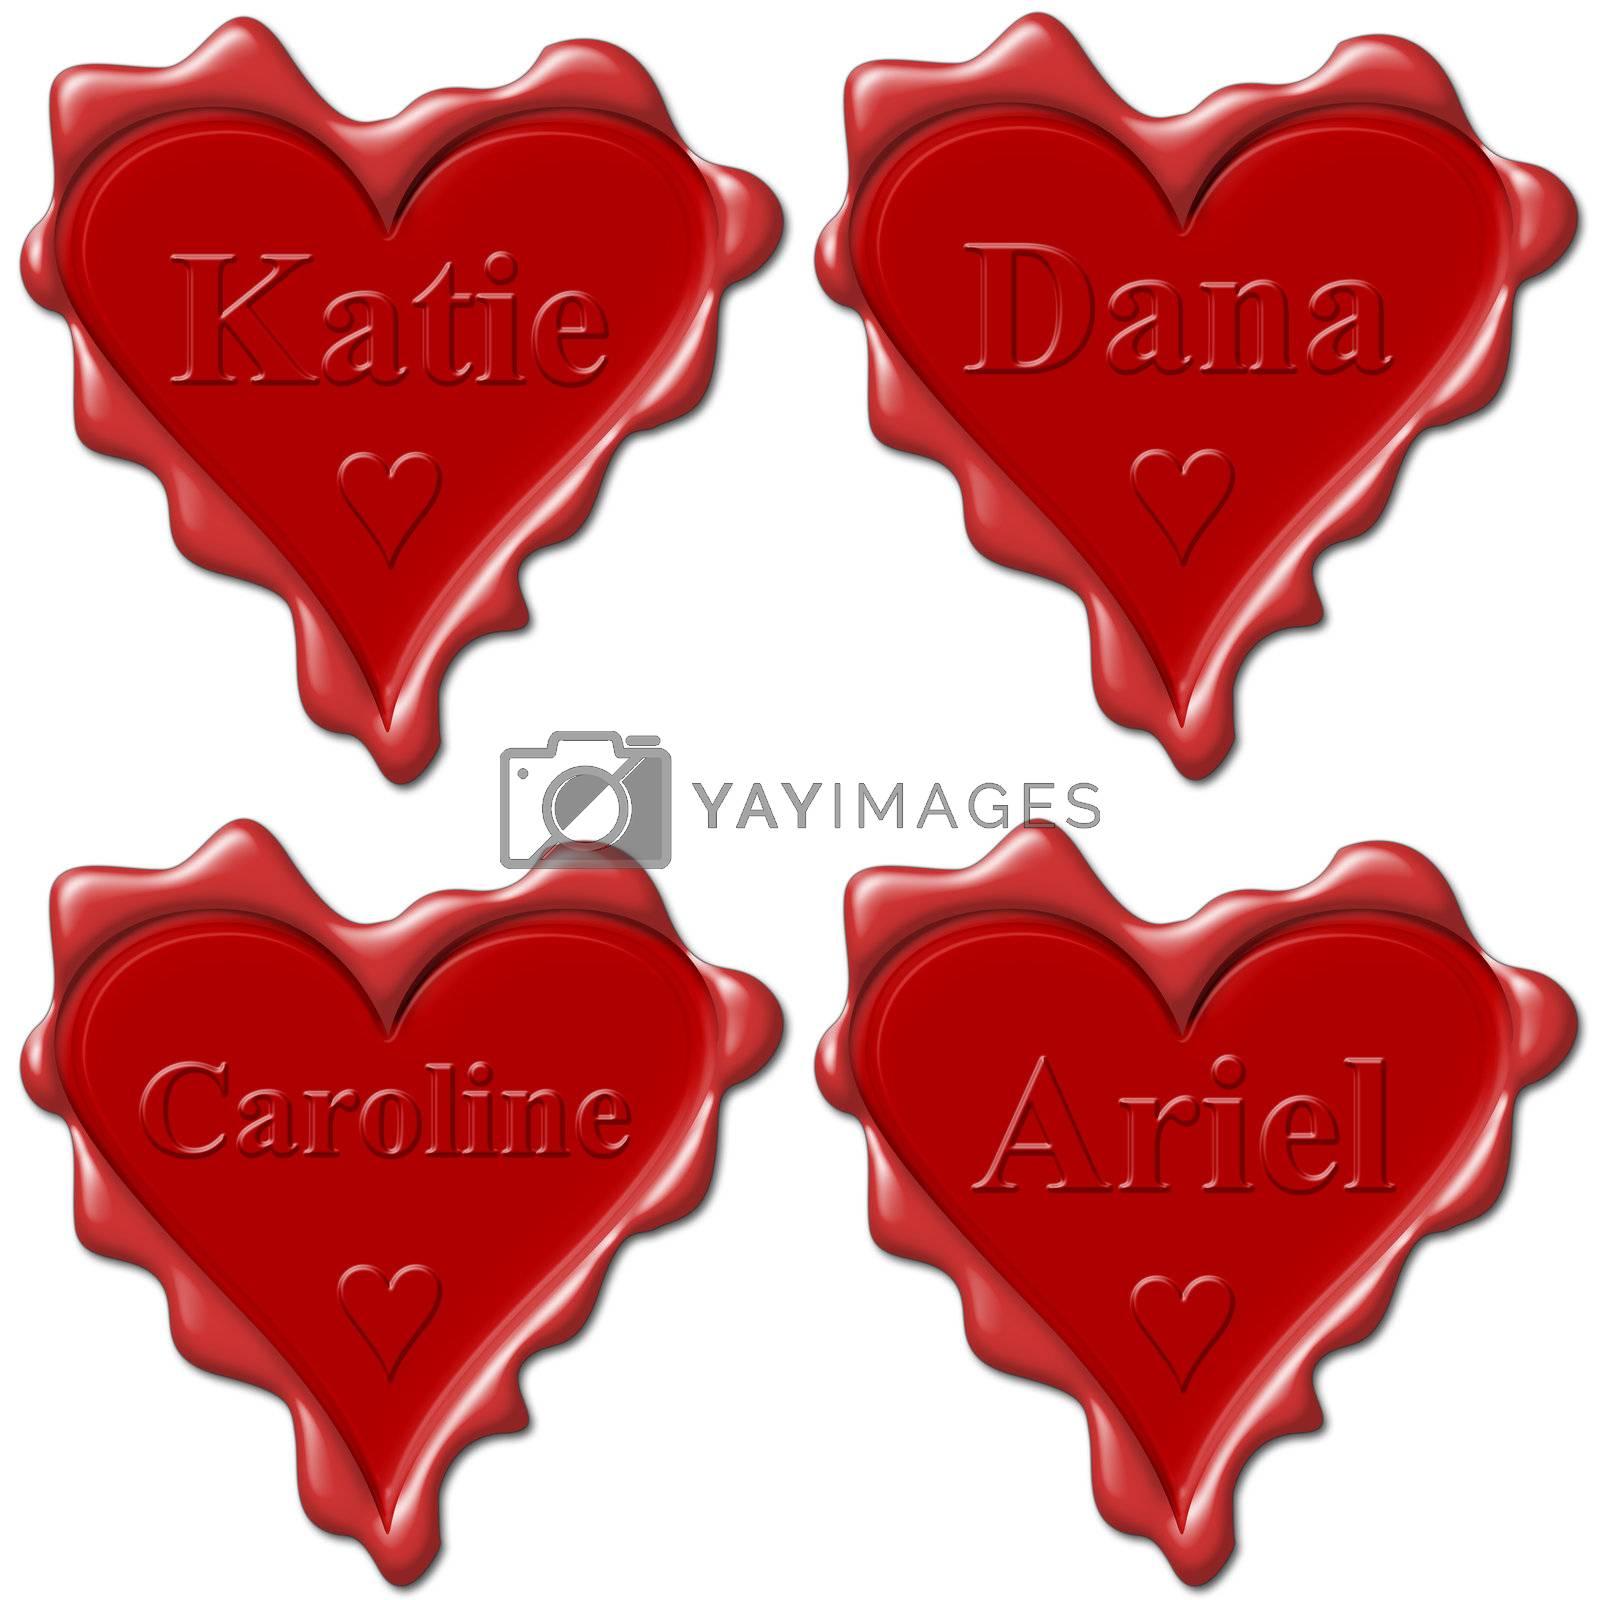 Valentine love hearts with names: Katie, Dana, Caroline, Ariel